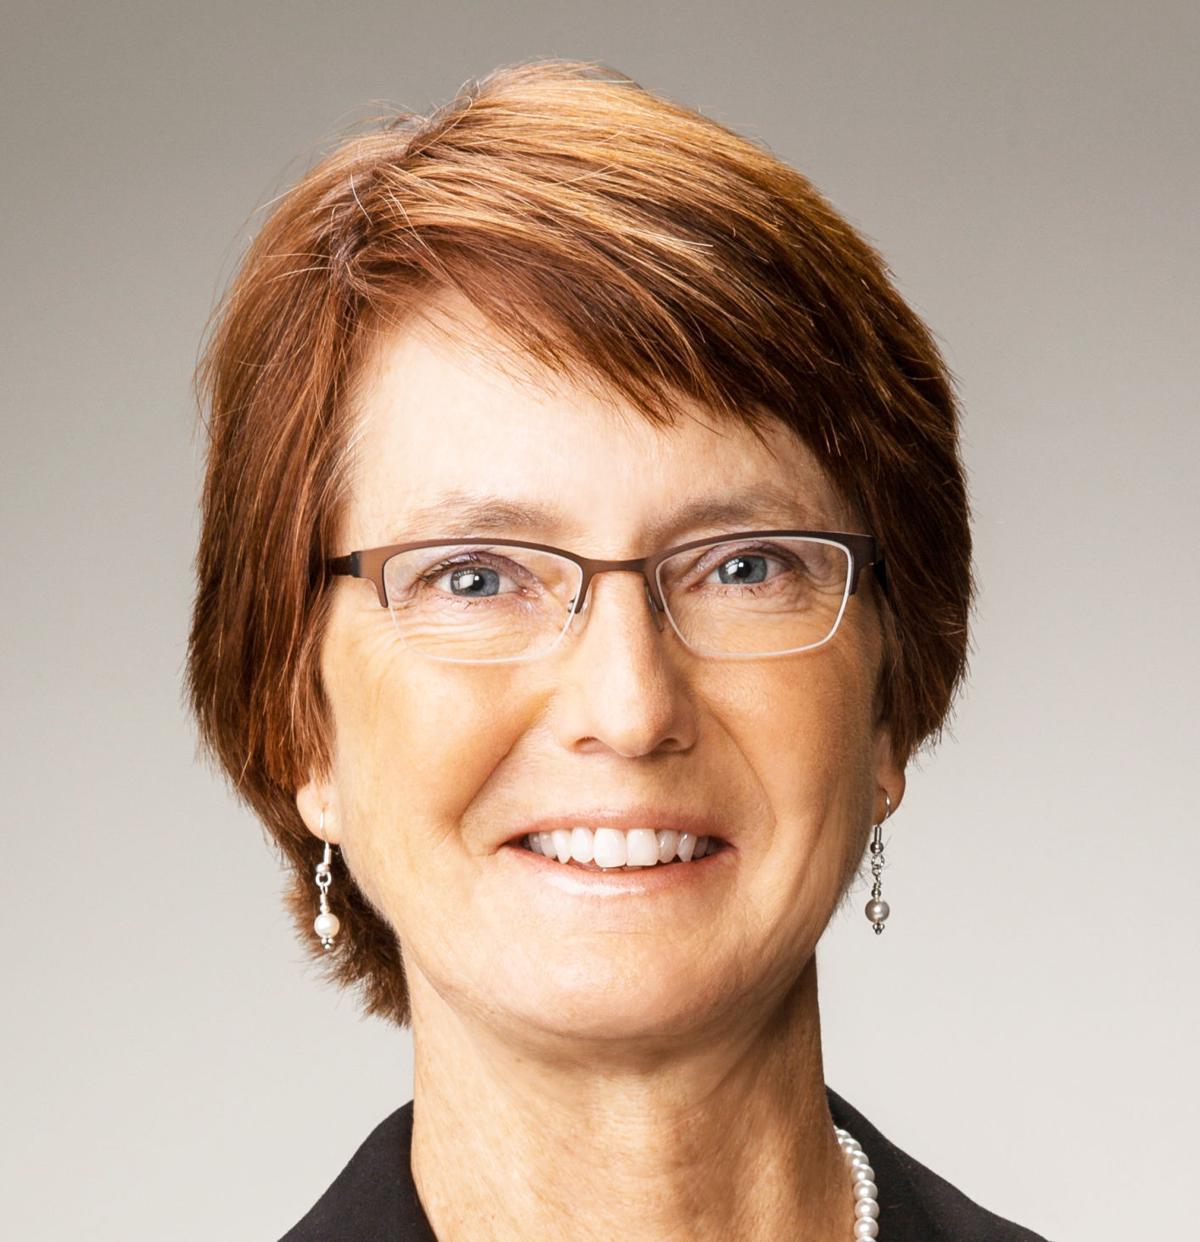 Margaret Gorski